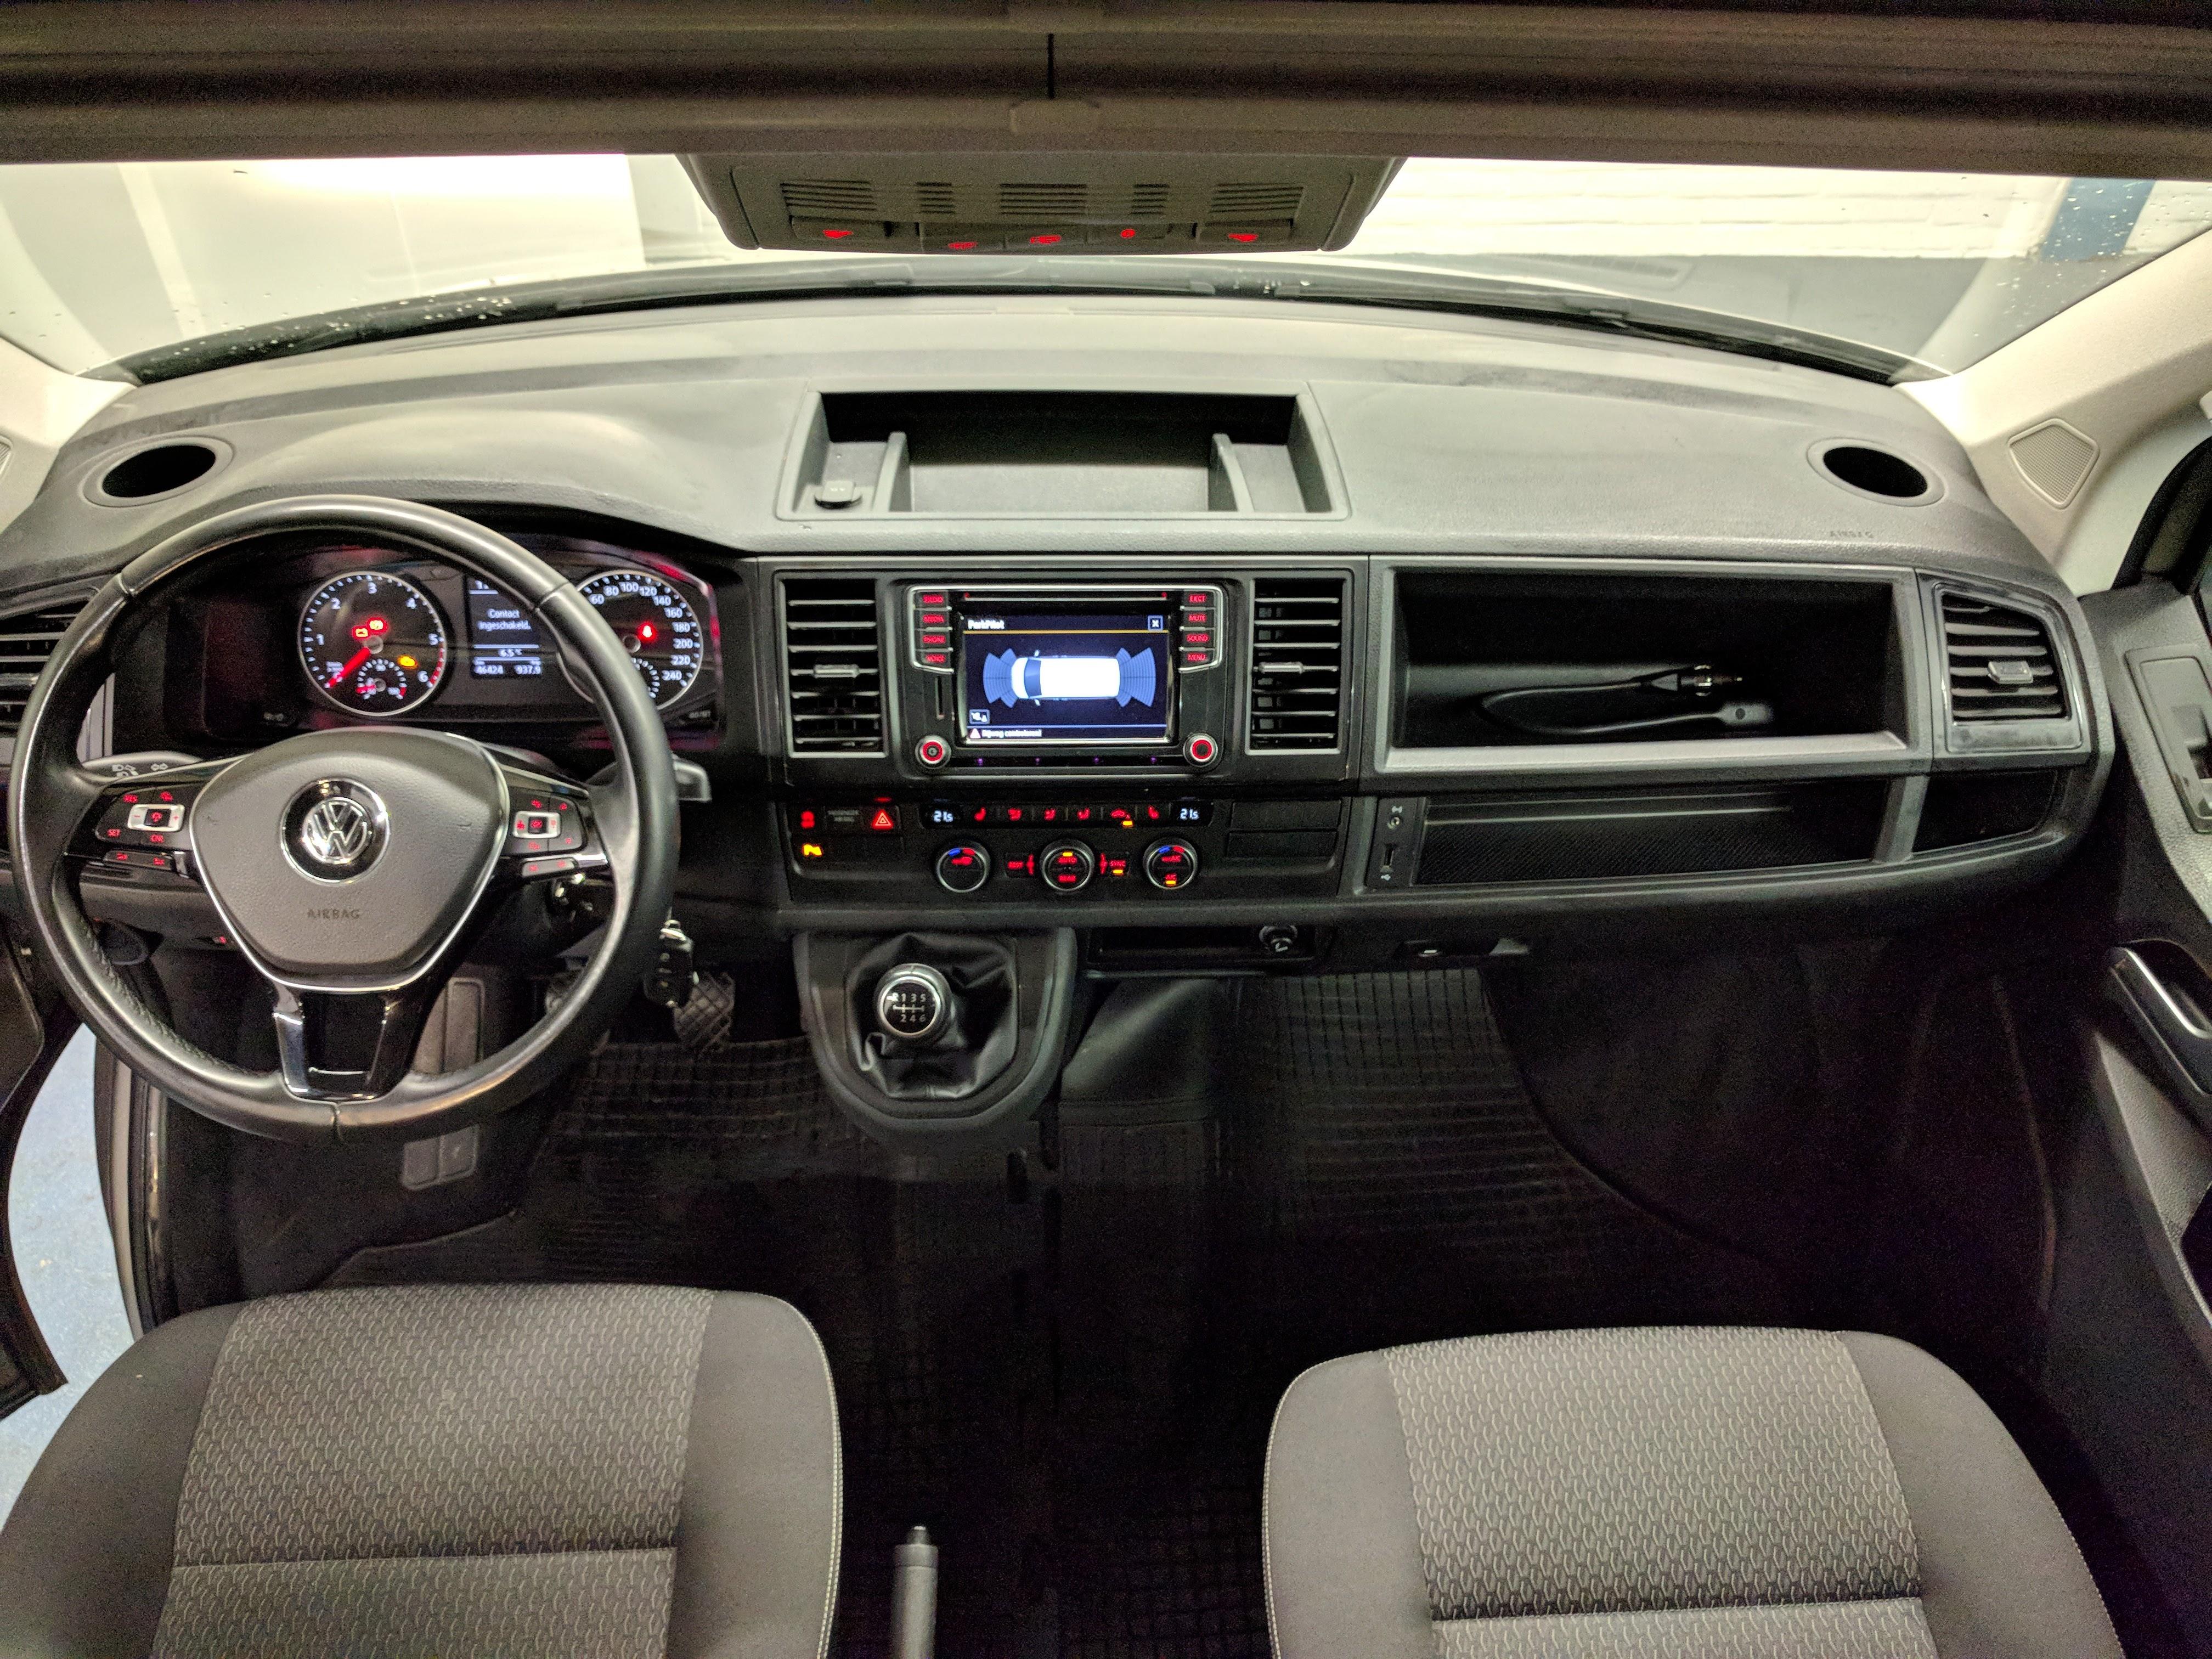 Volkswagen California Beach VW T6 2.0 TDI 150PK 2016 - MyCalifornia